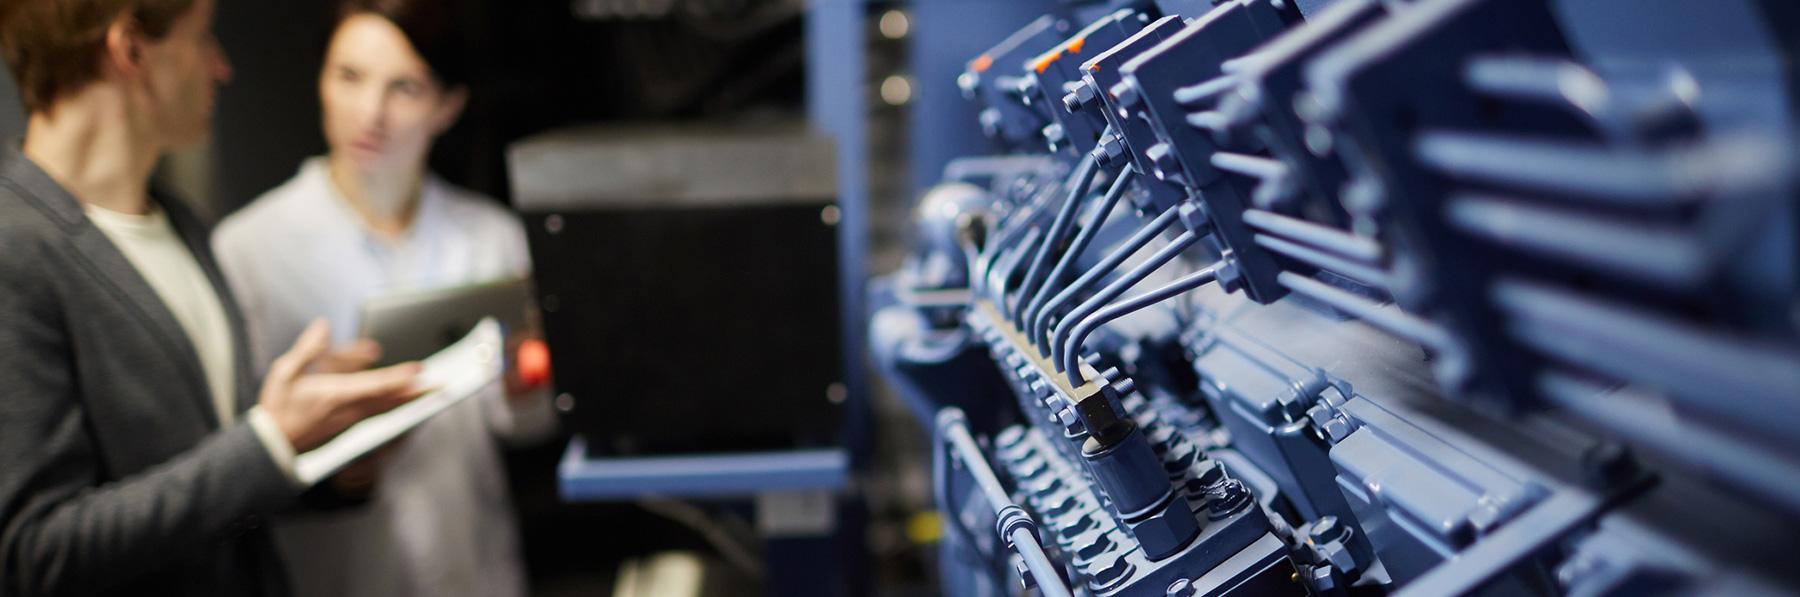 img-s03-Server-Network